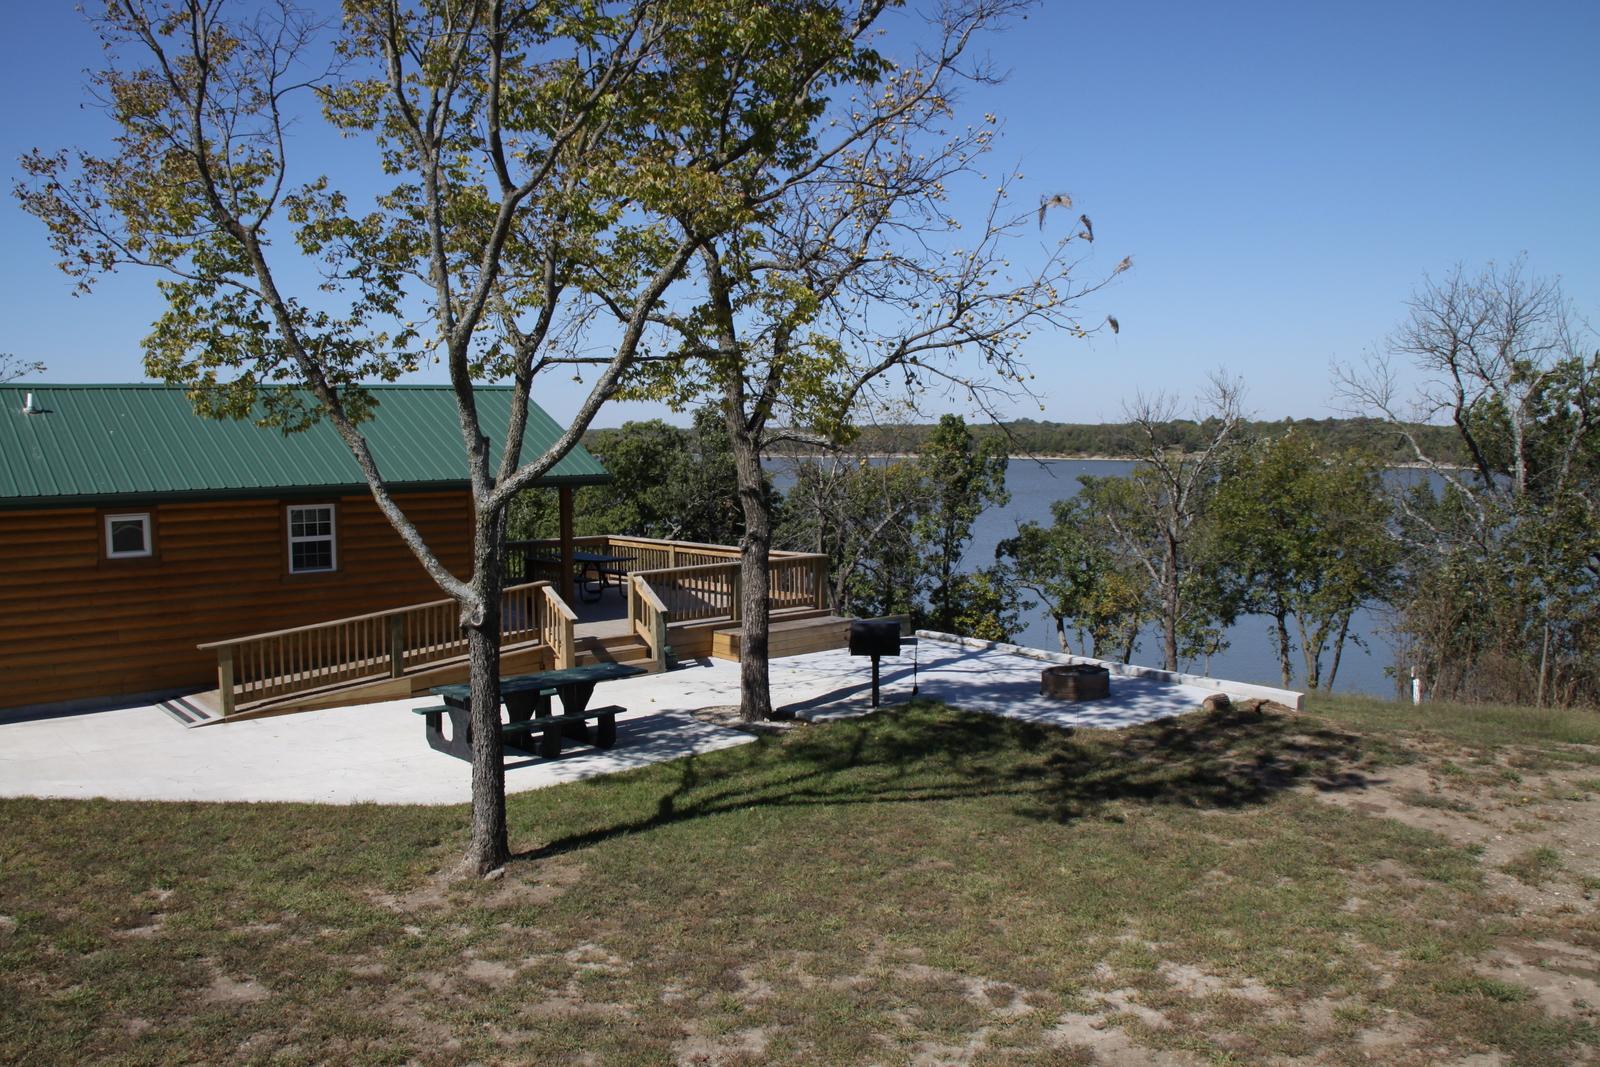 pomona gallery pomona locations state parks kdwpt